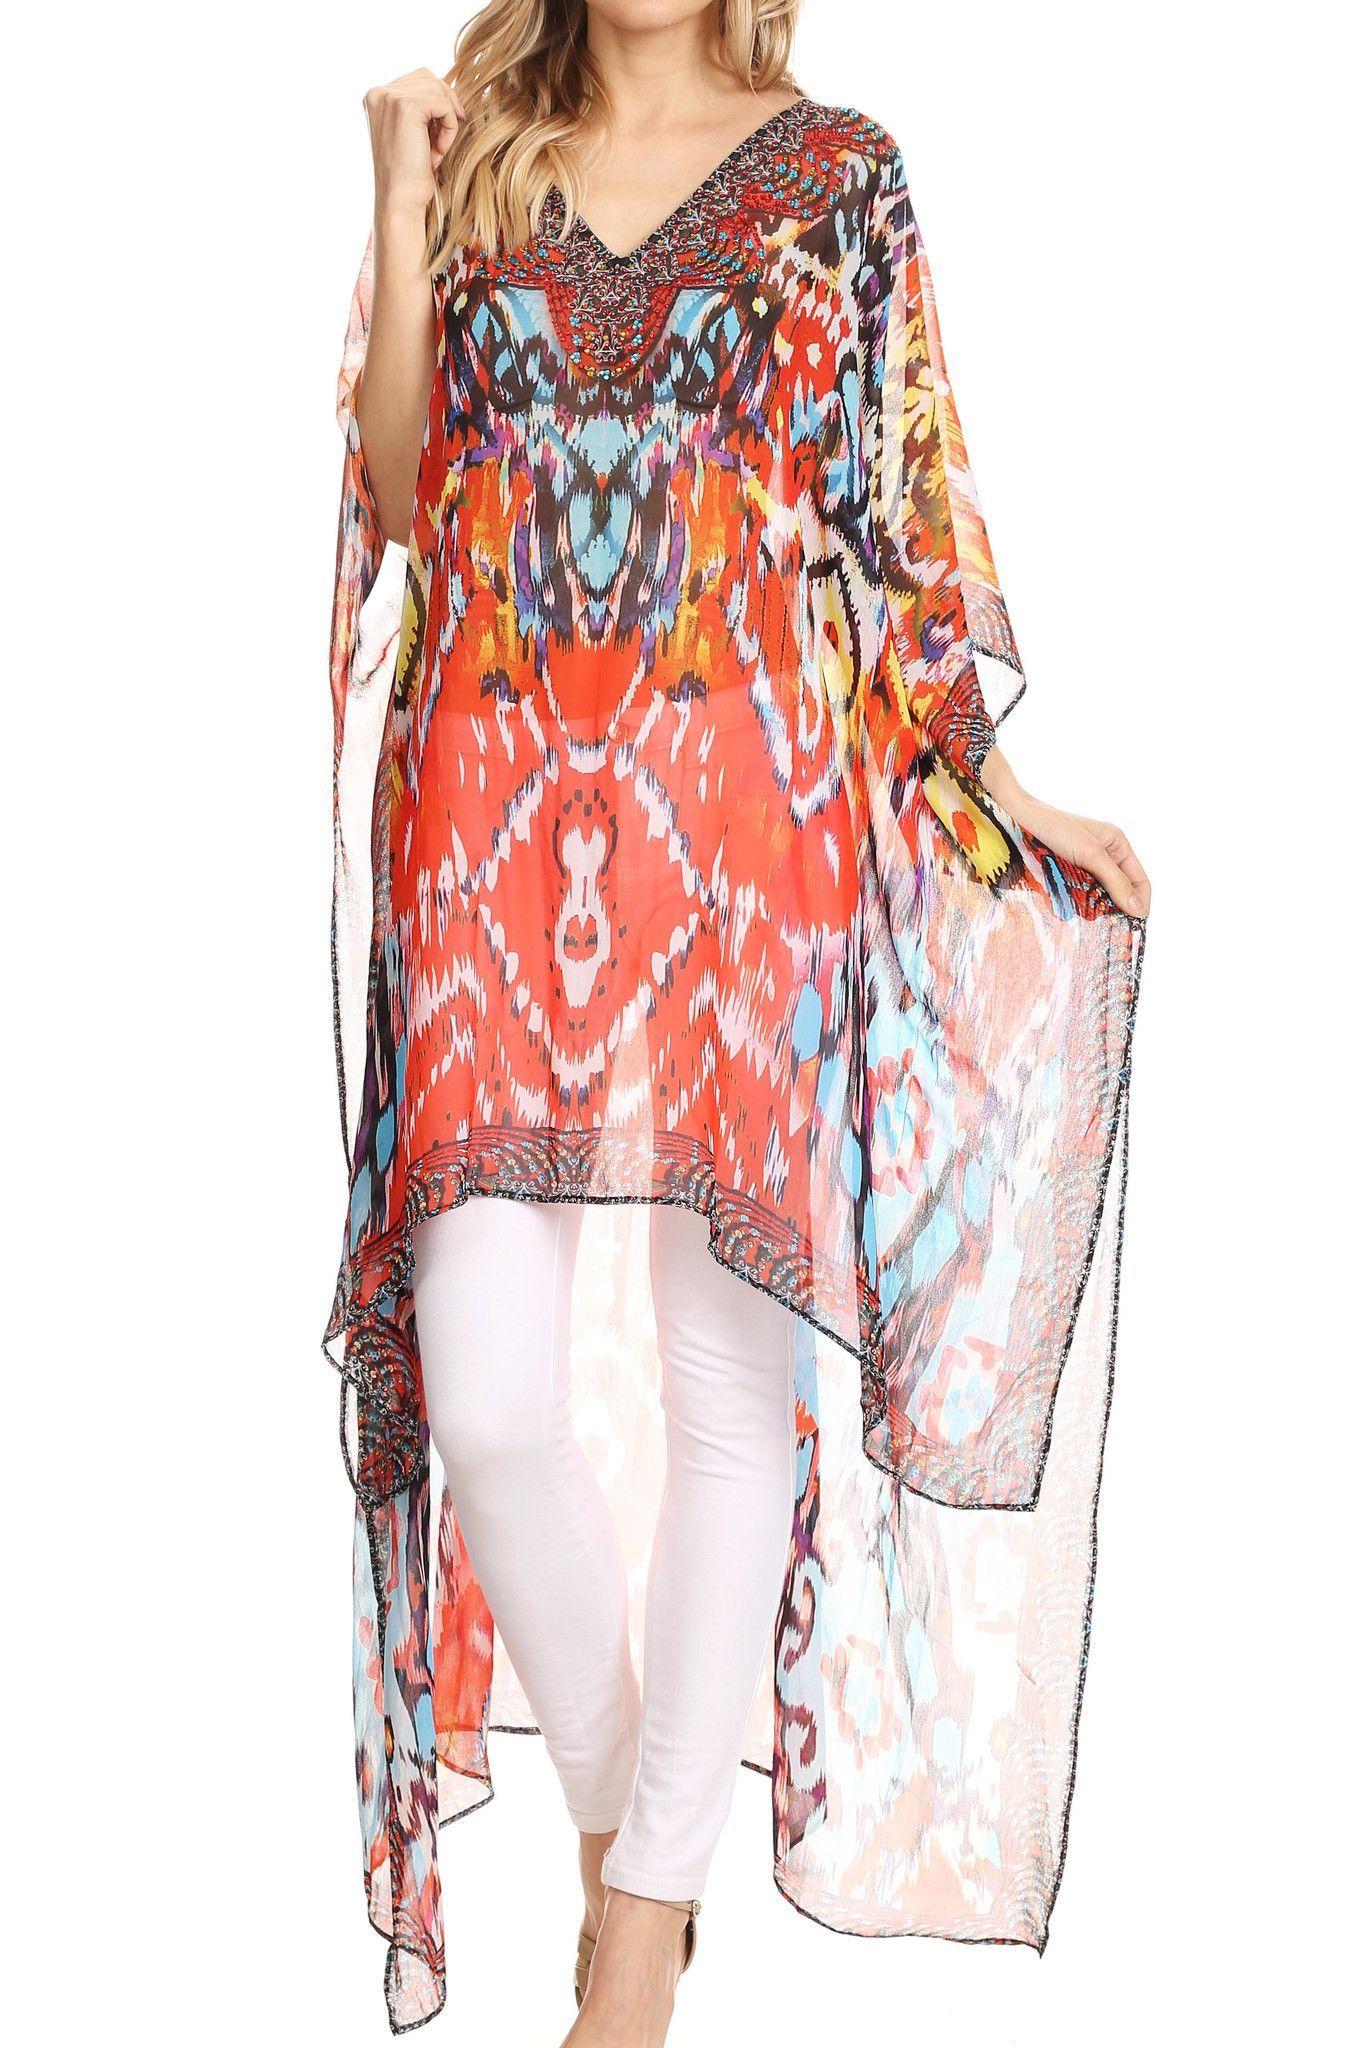 932653a71b4 Sakkas Zeke Hi Low Rhinestone V-Neck Caftan Dress Boxy Printed Top Cover    Up